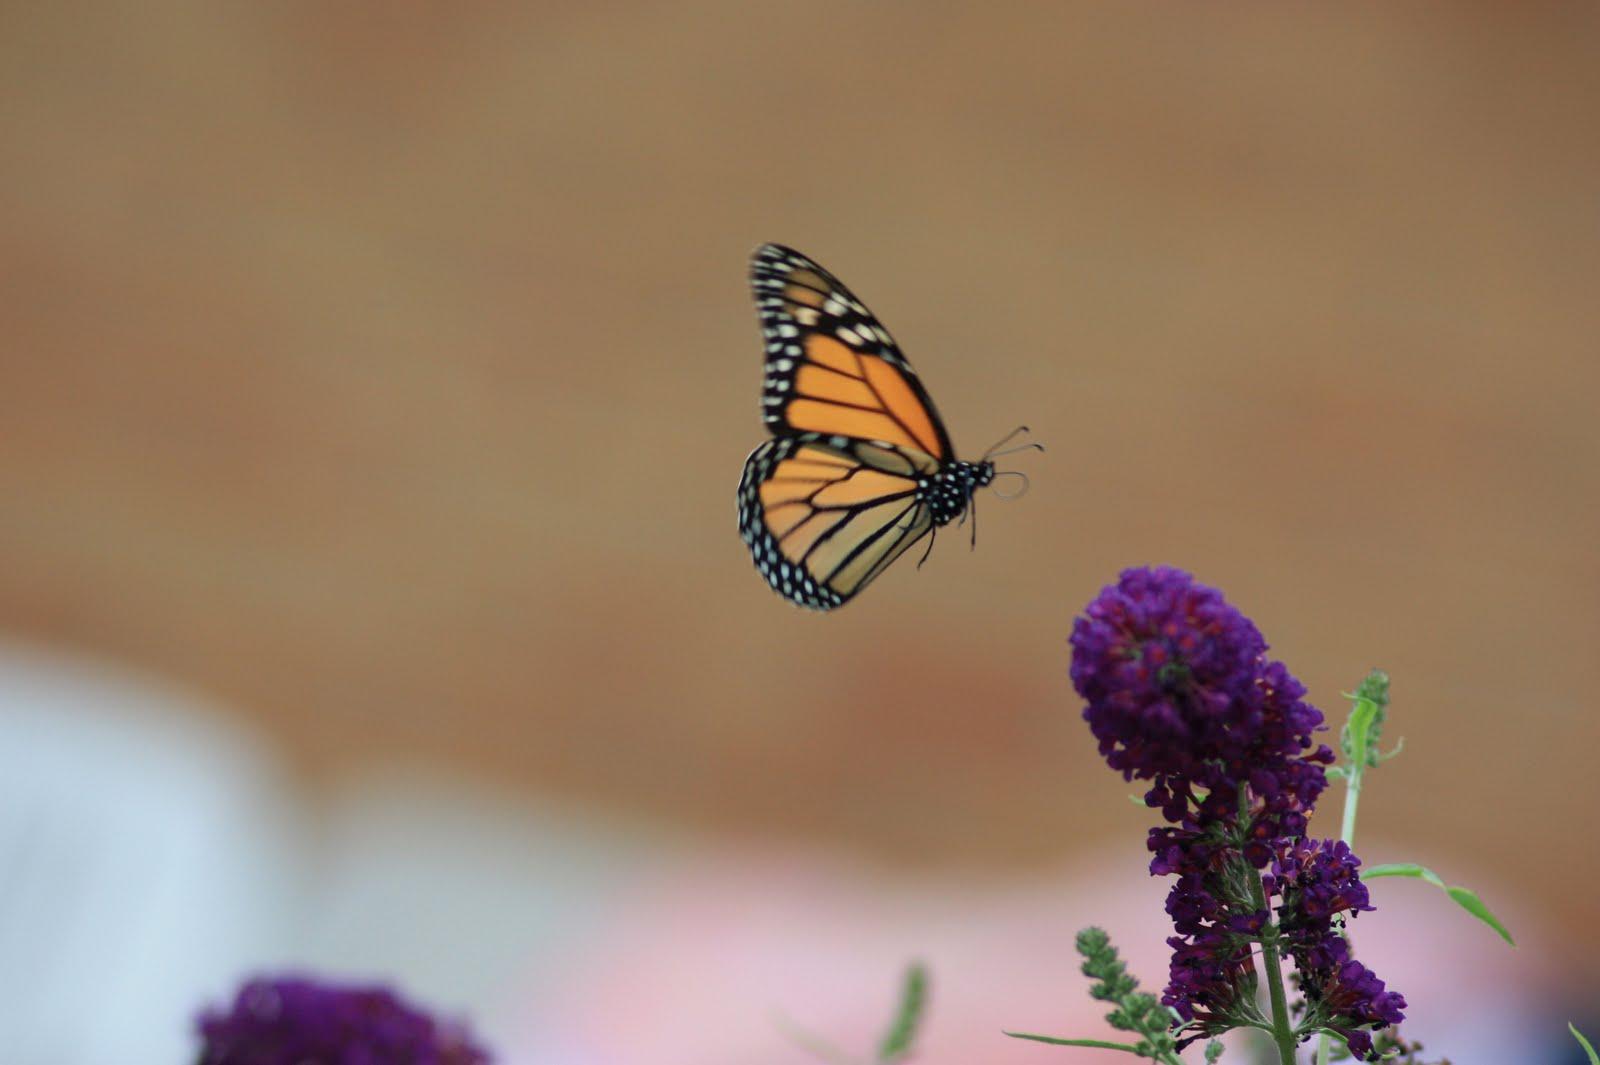 Butterflywatching: Monarch Flight